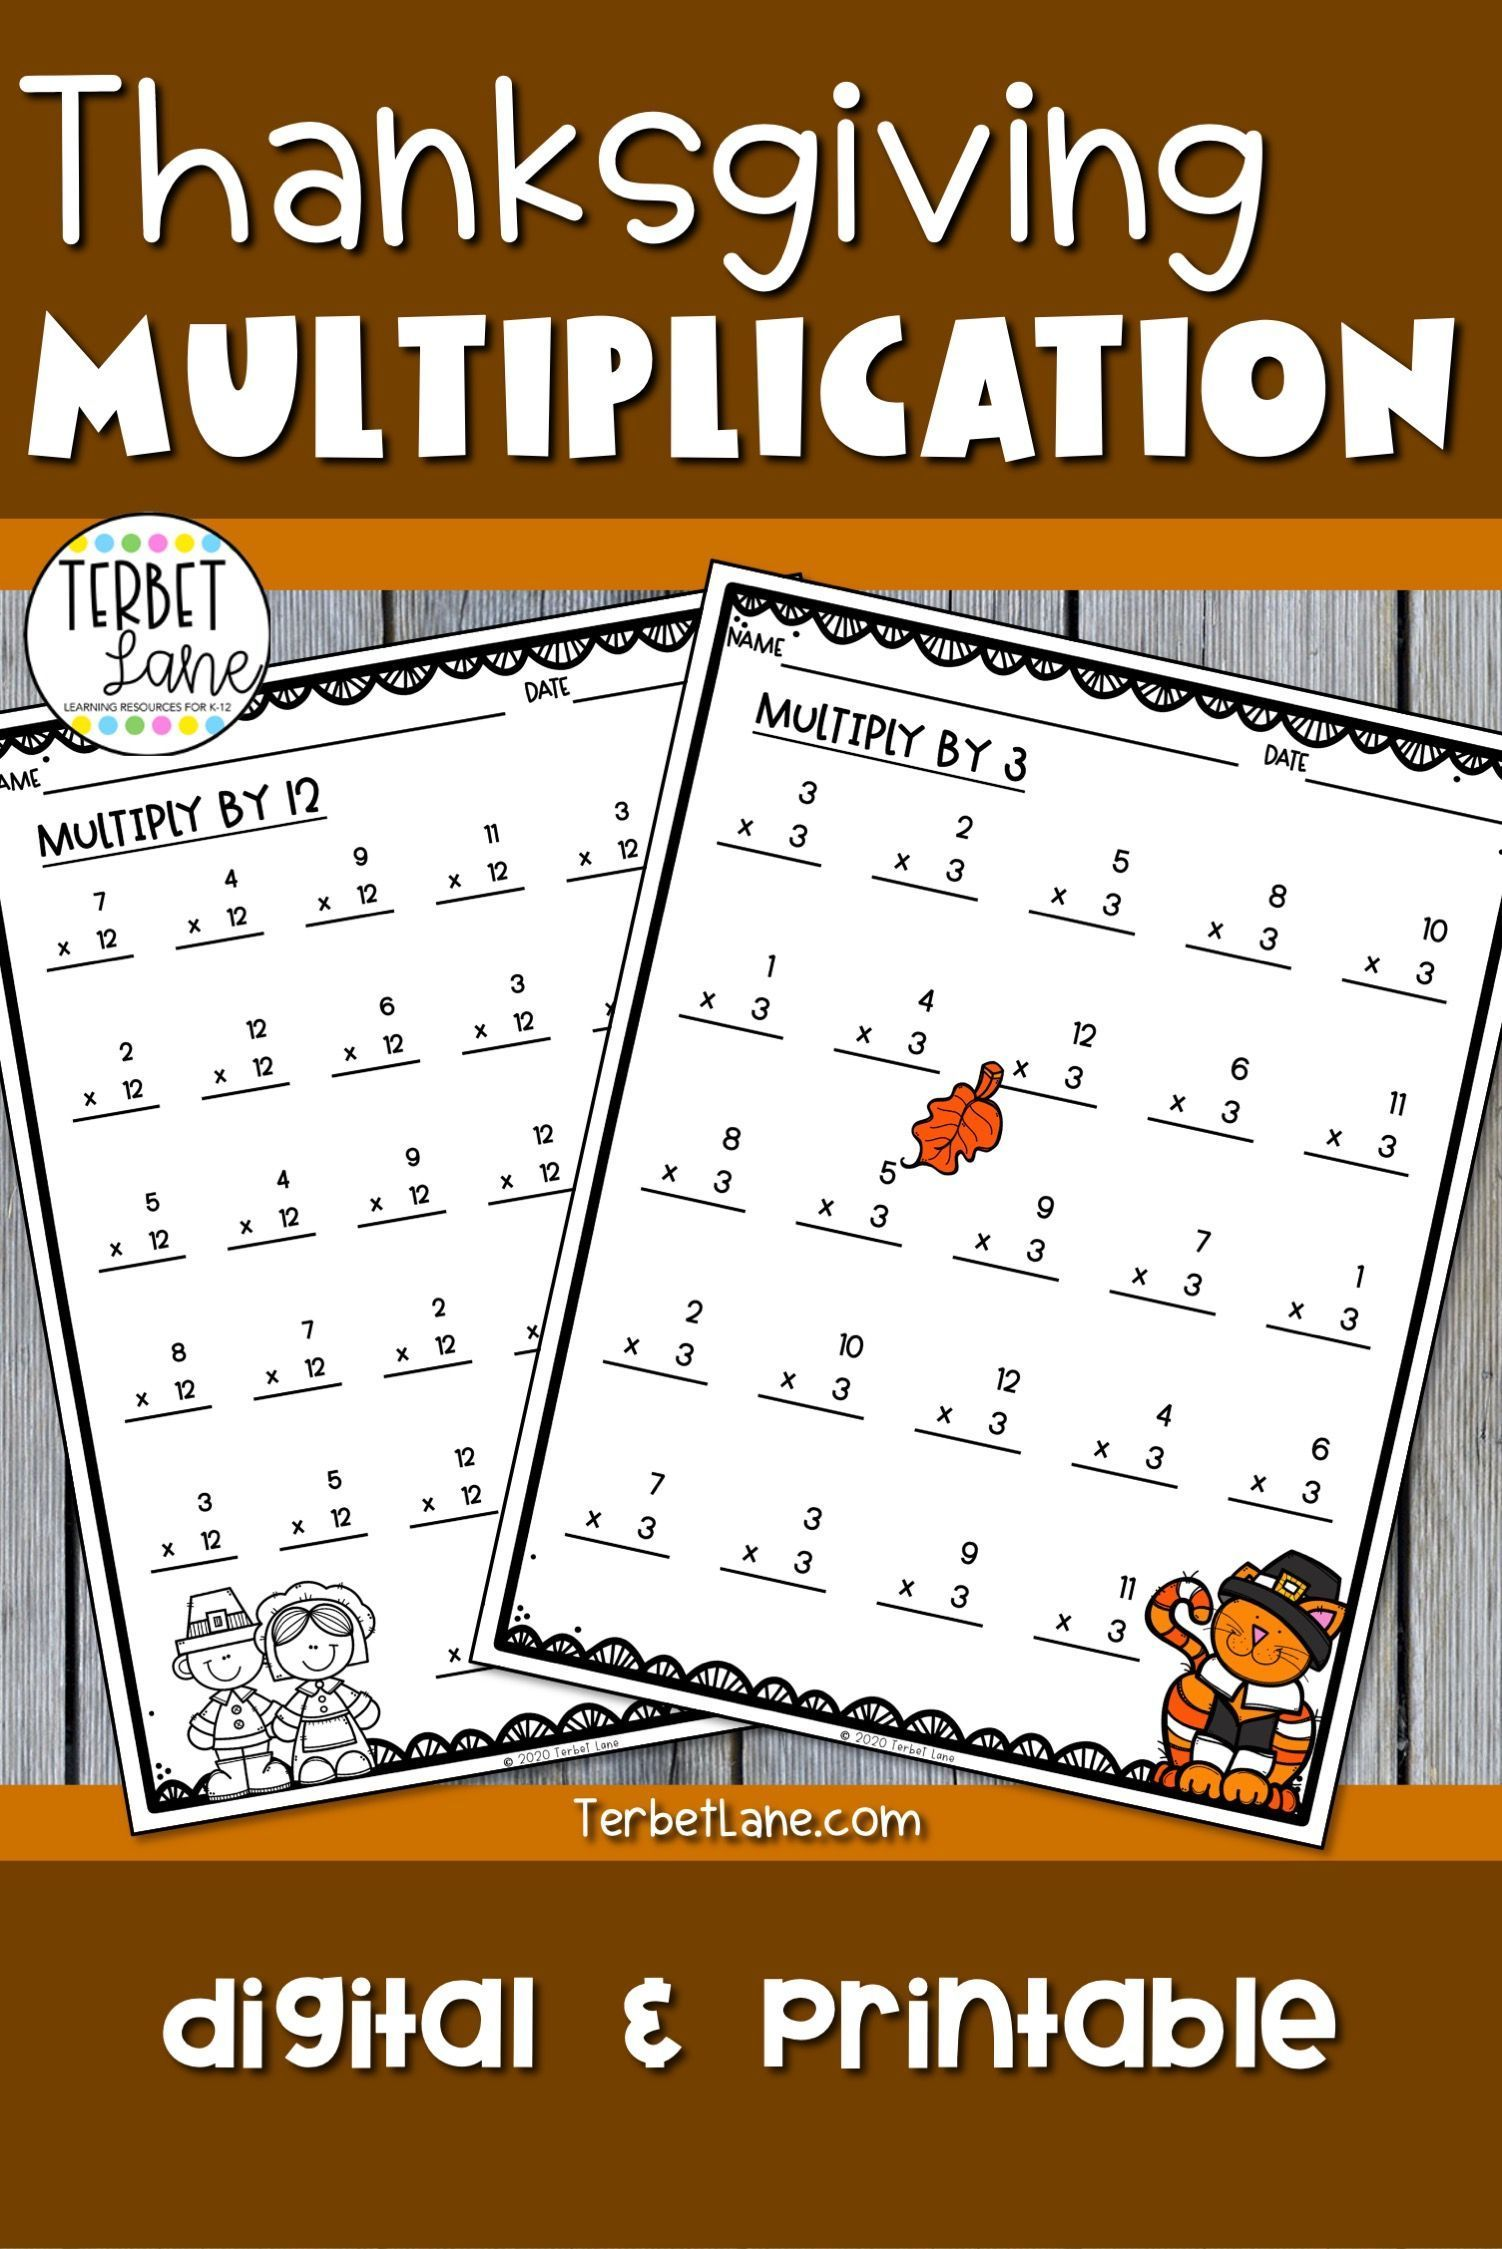 Thanksgiving Multiplication Worksheets \u0026 Digital Activities   Thanksgiving  multiplication worksheets [ 2249 x 1502 Pixel ]